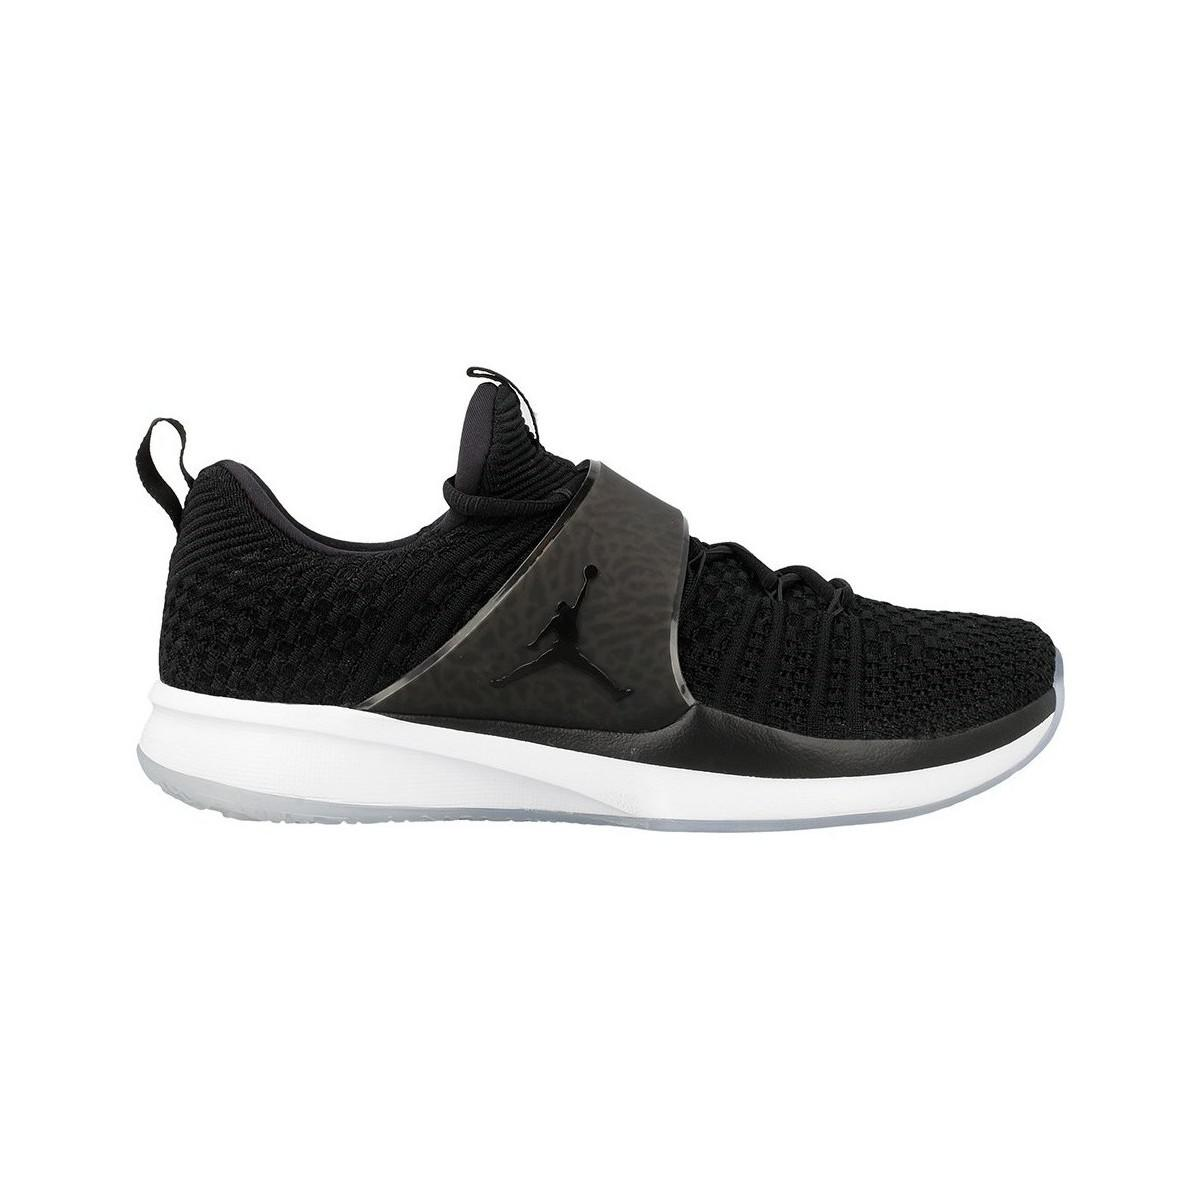 848484f8e13 Nike Jordan Trainer 2 Flyknit Men s Shoes (trainers) In White in ...